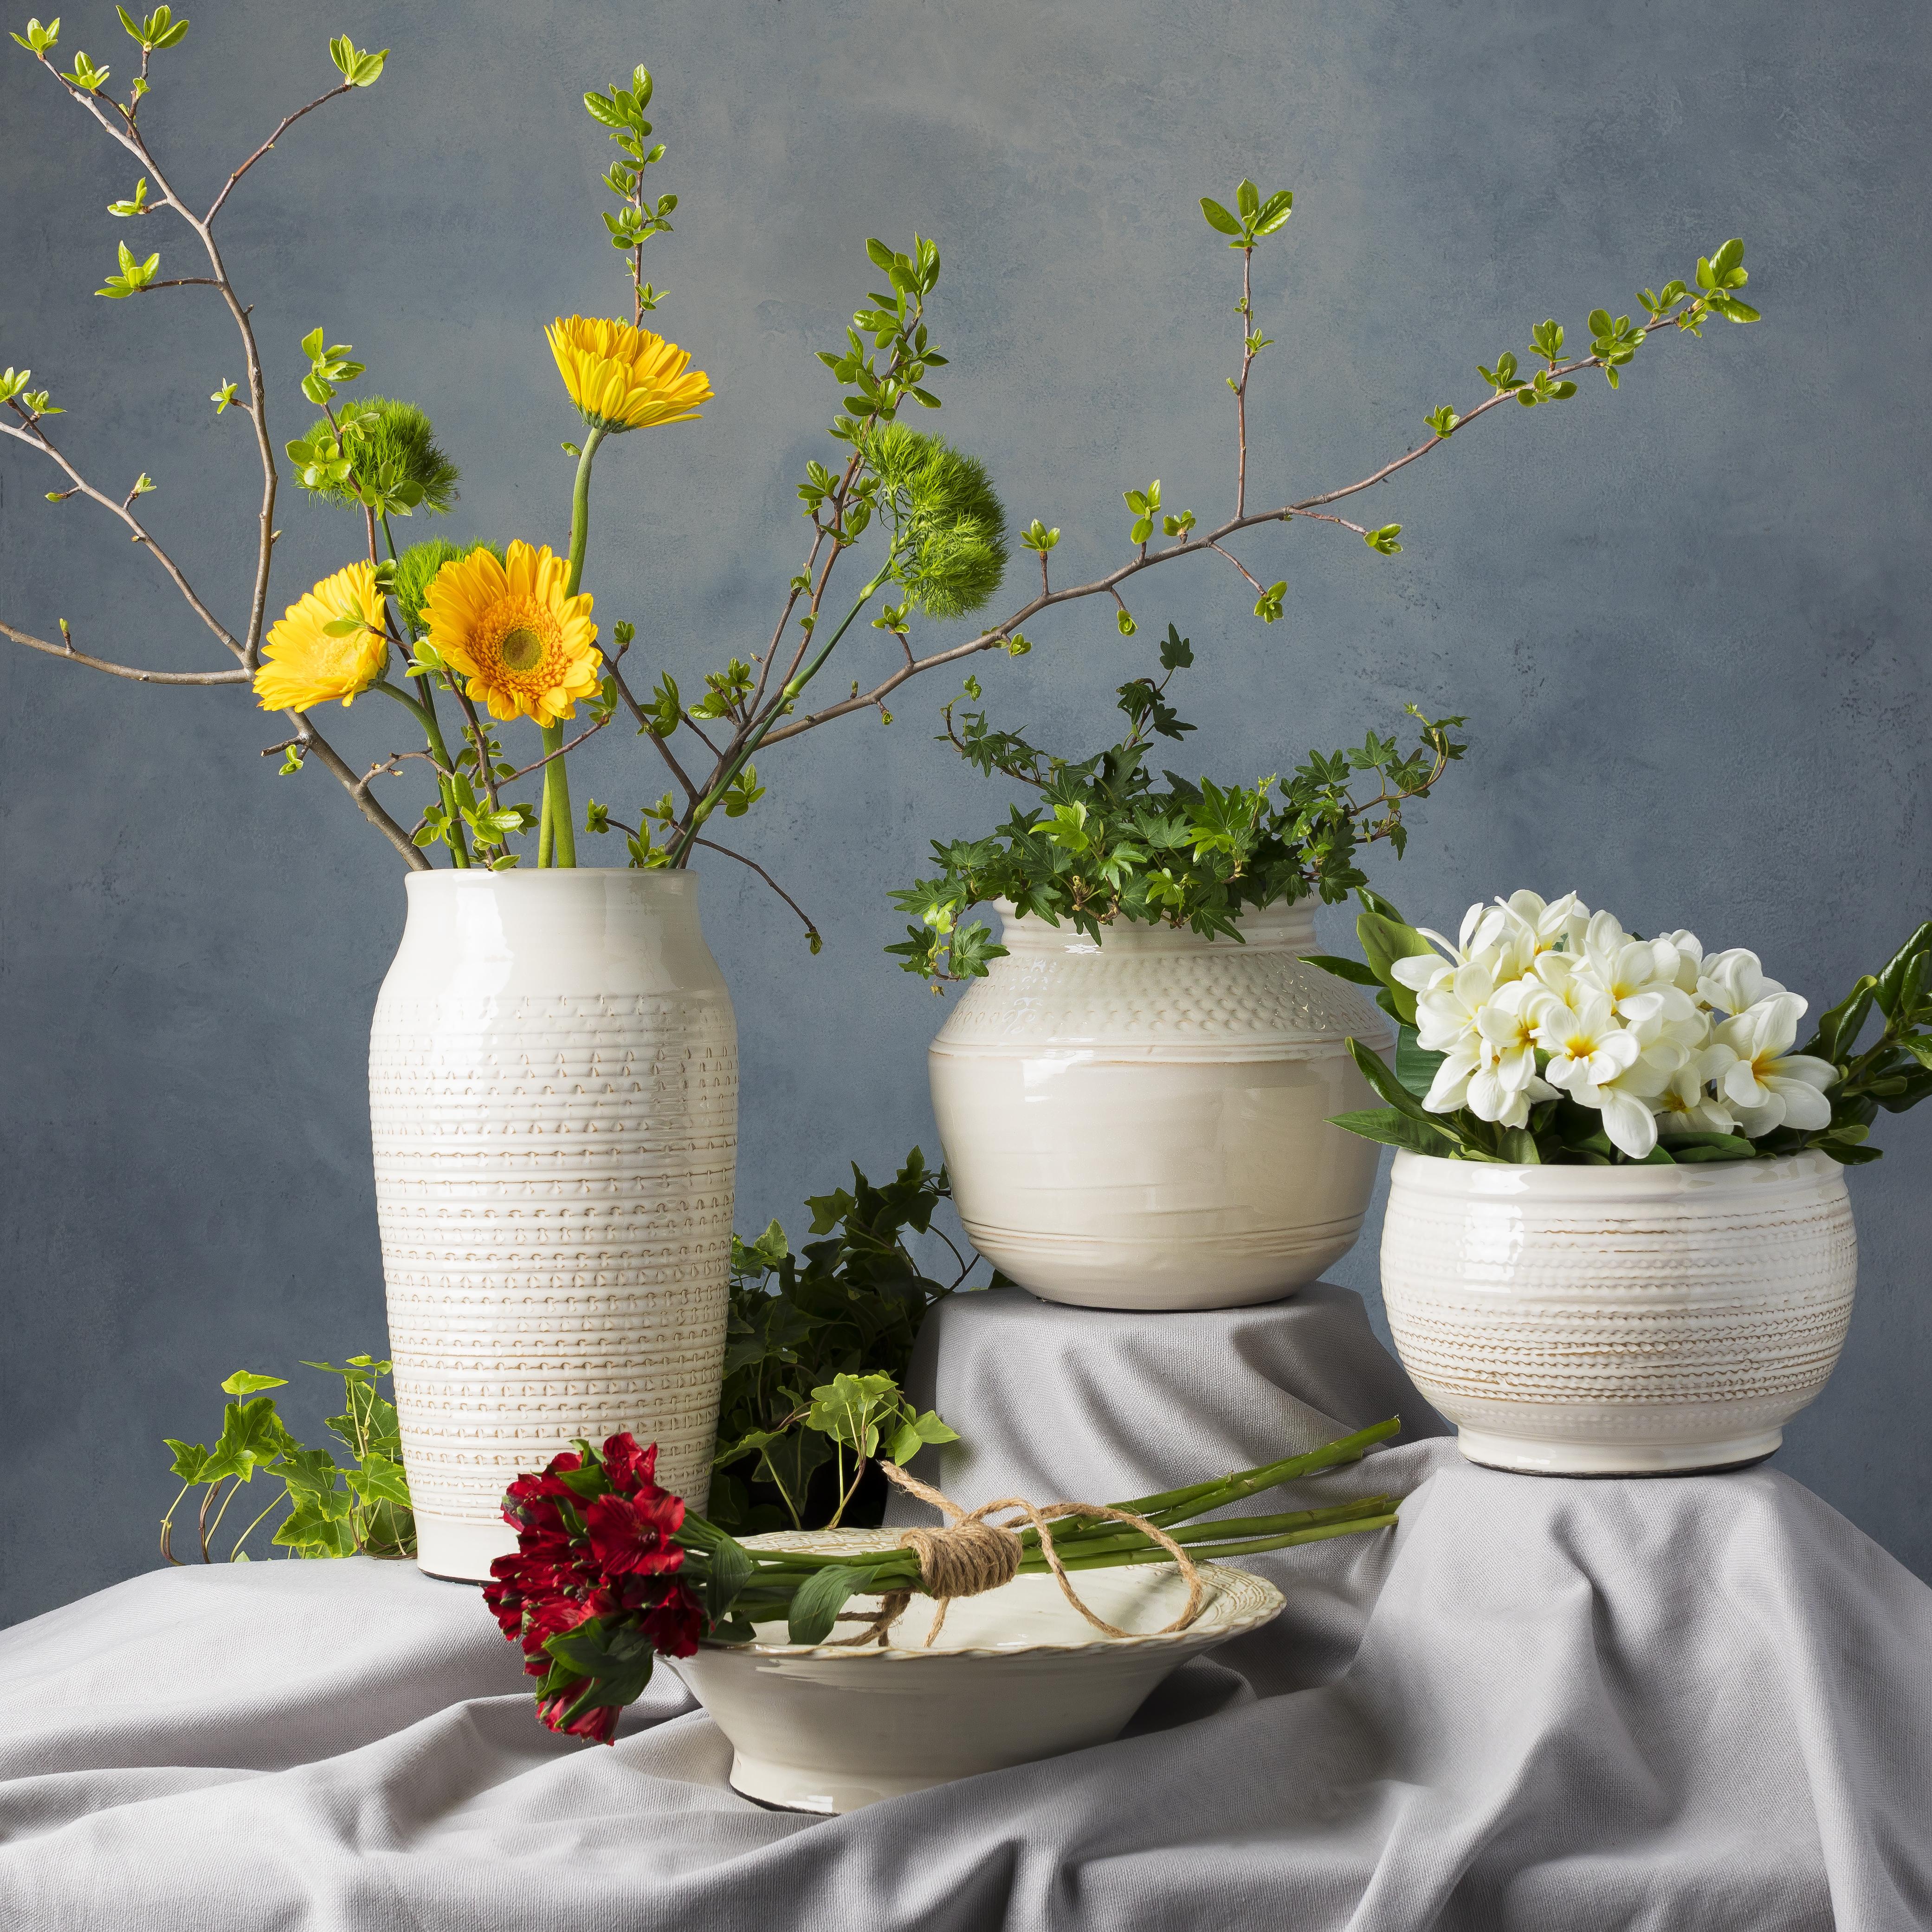 Piccoli 10.63 x 10.63 x 8.86 Table Vase